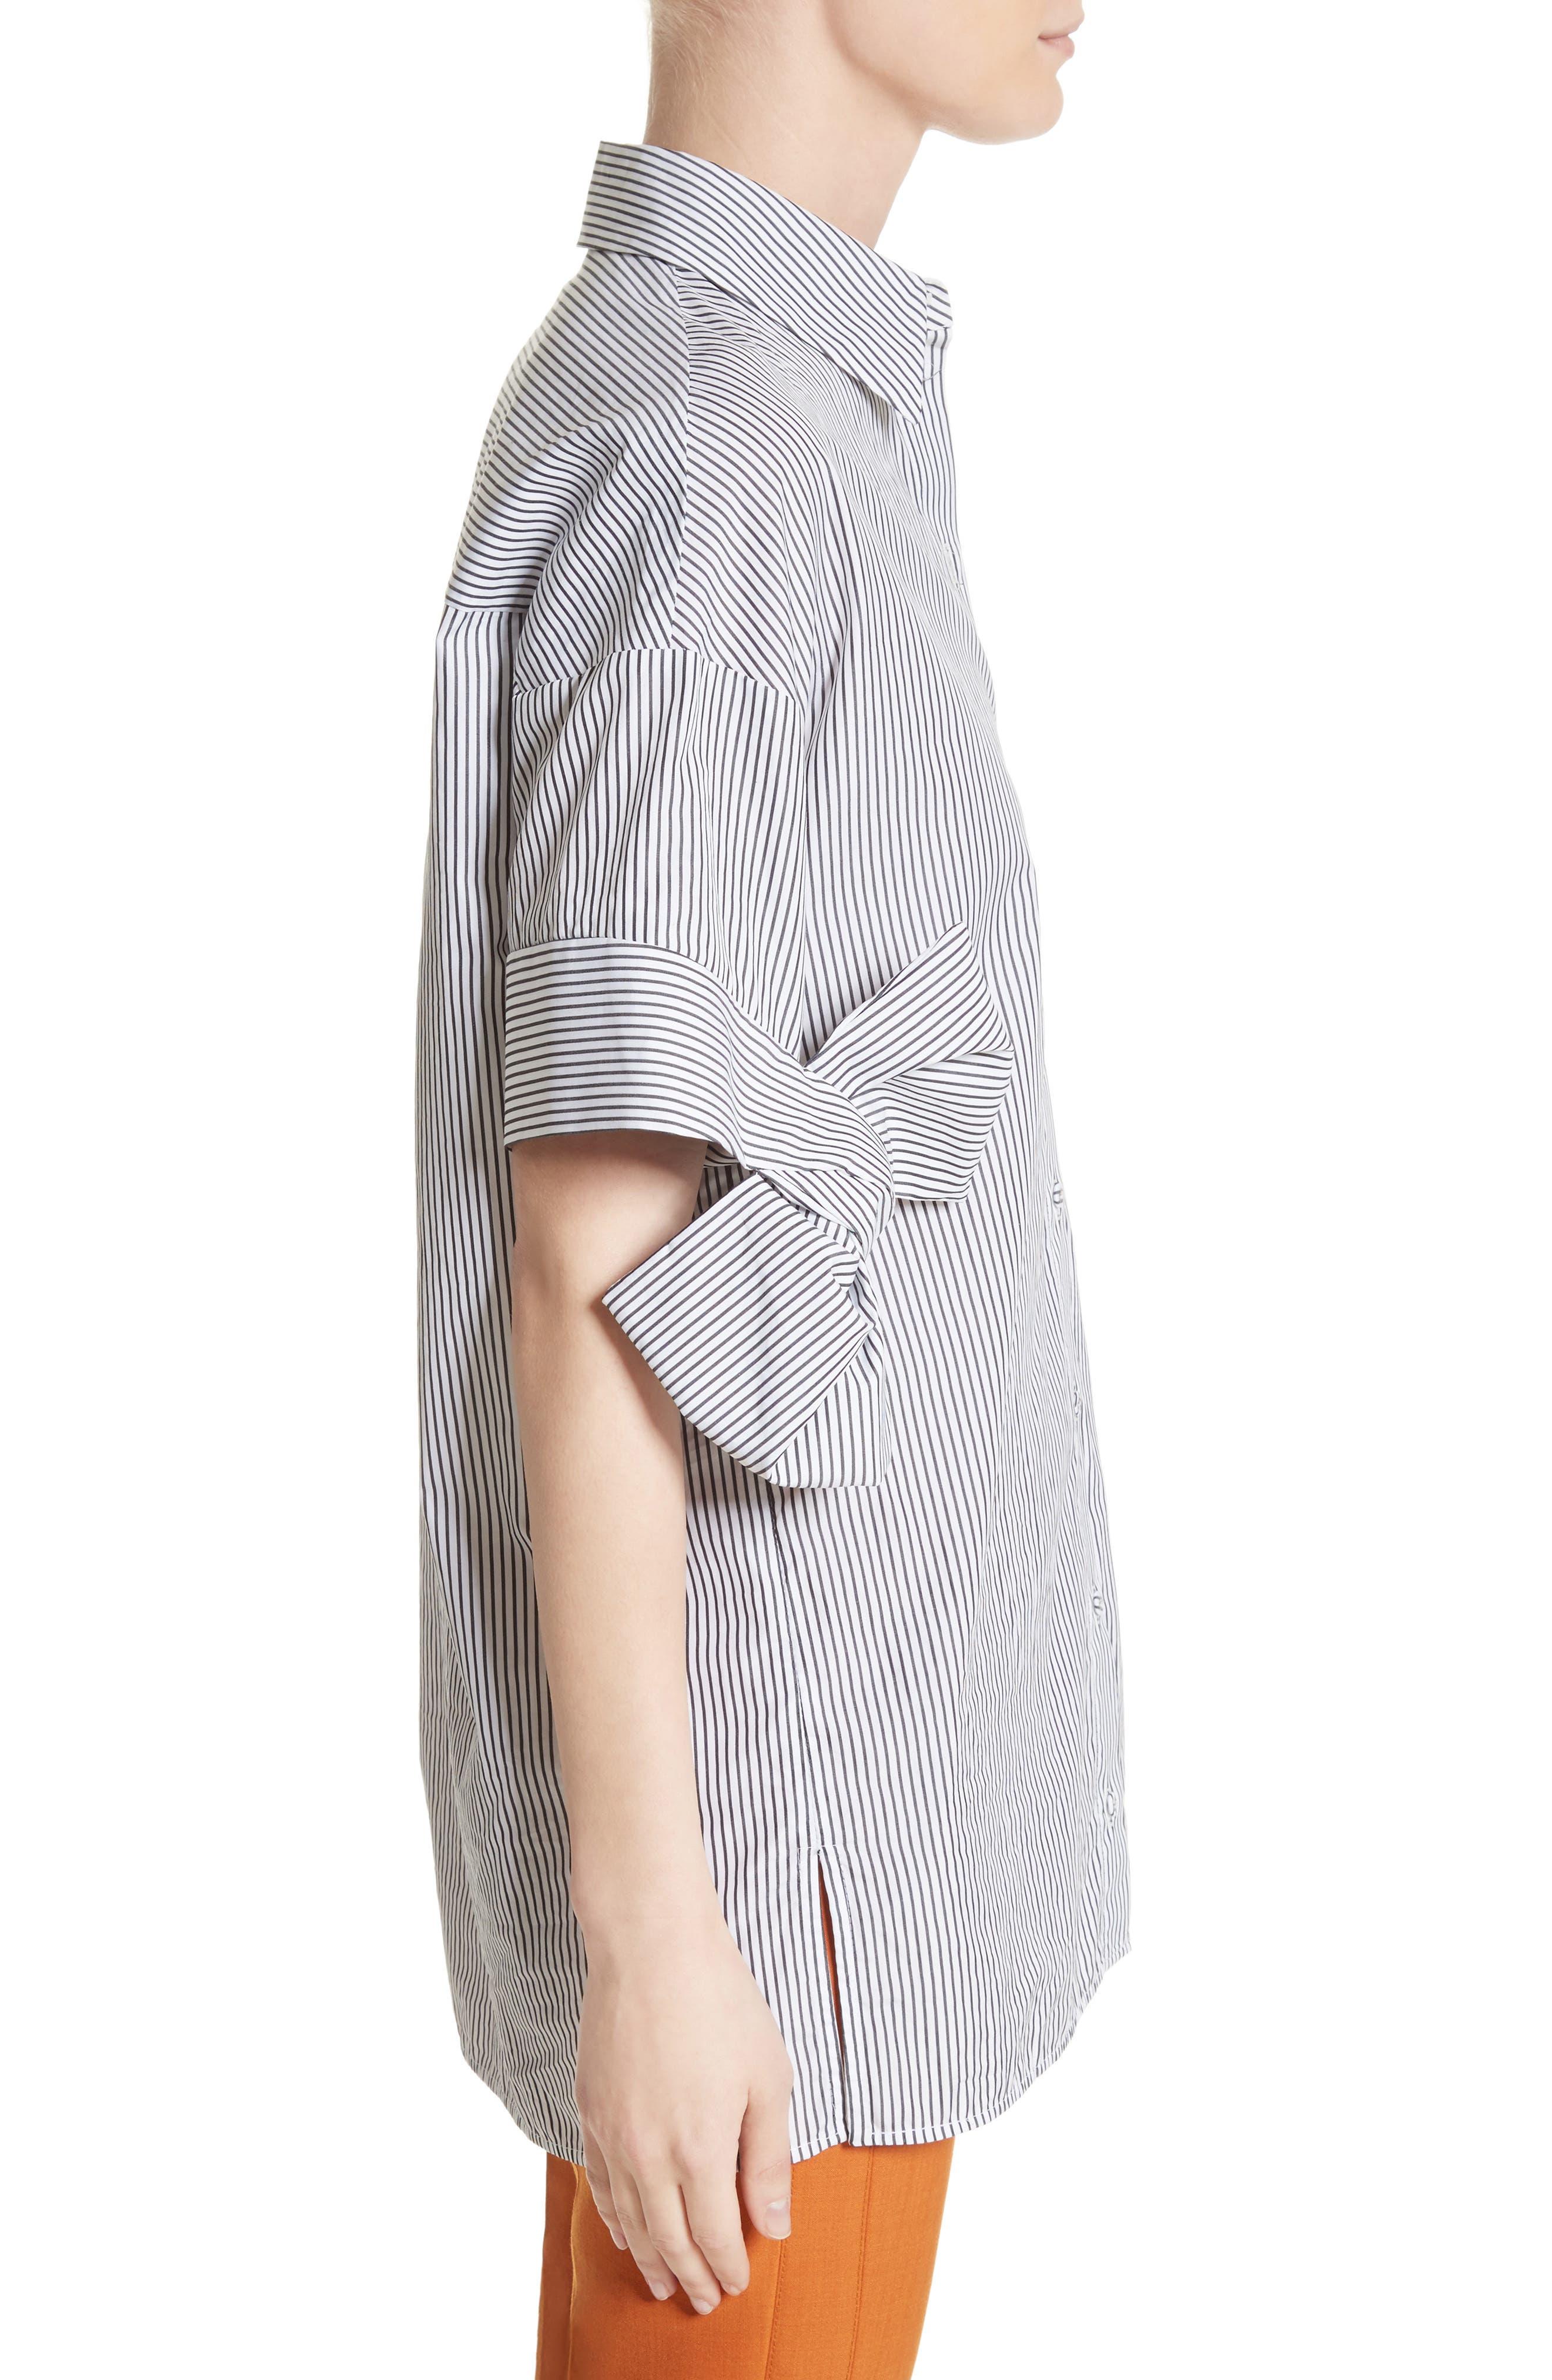 Bow Sleeve Shirt,                             Alternate thumbnail 3, color,                             Black/ White